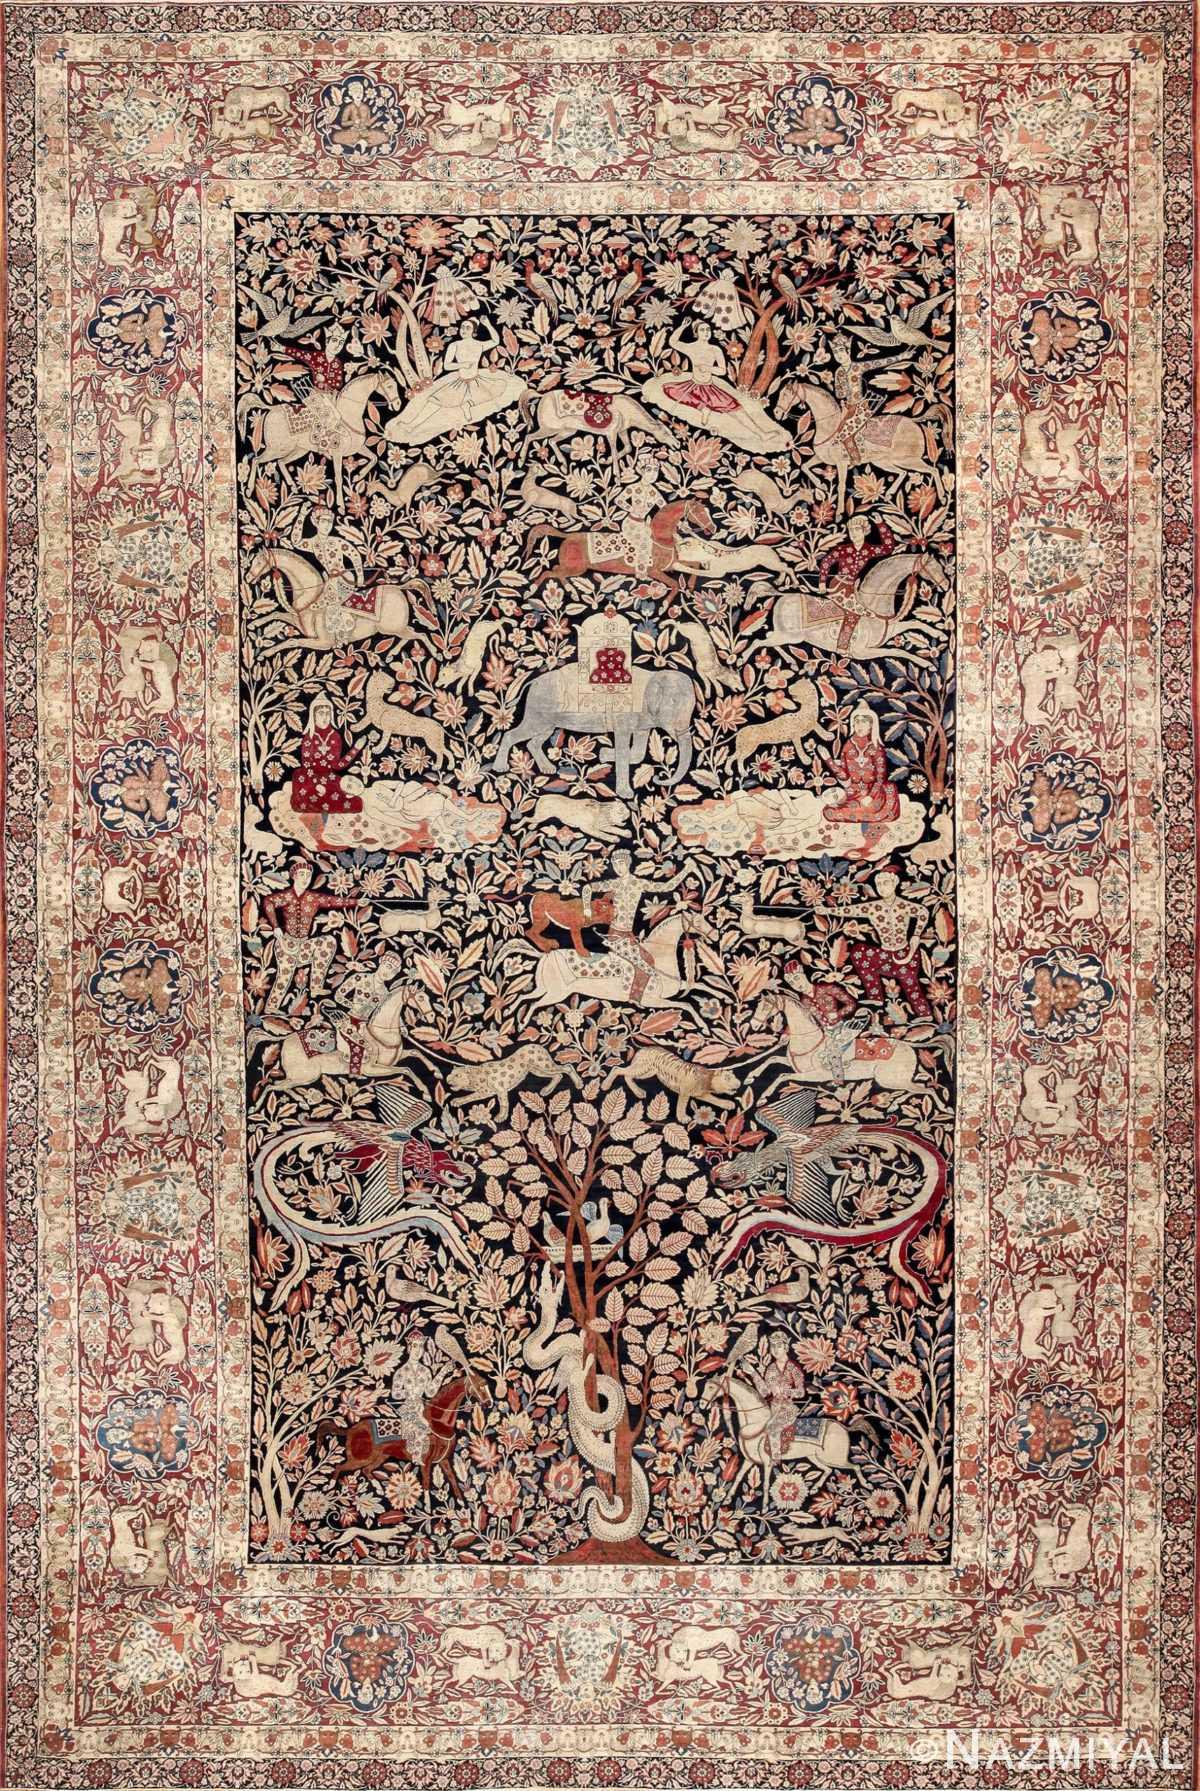 Antique Persian Hunting Scene Kerman Rug by Nazmiyal